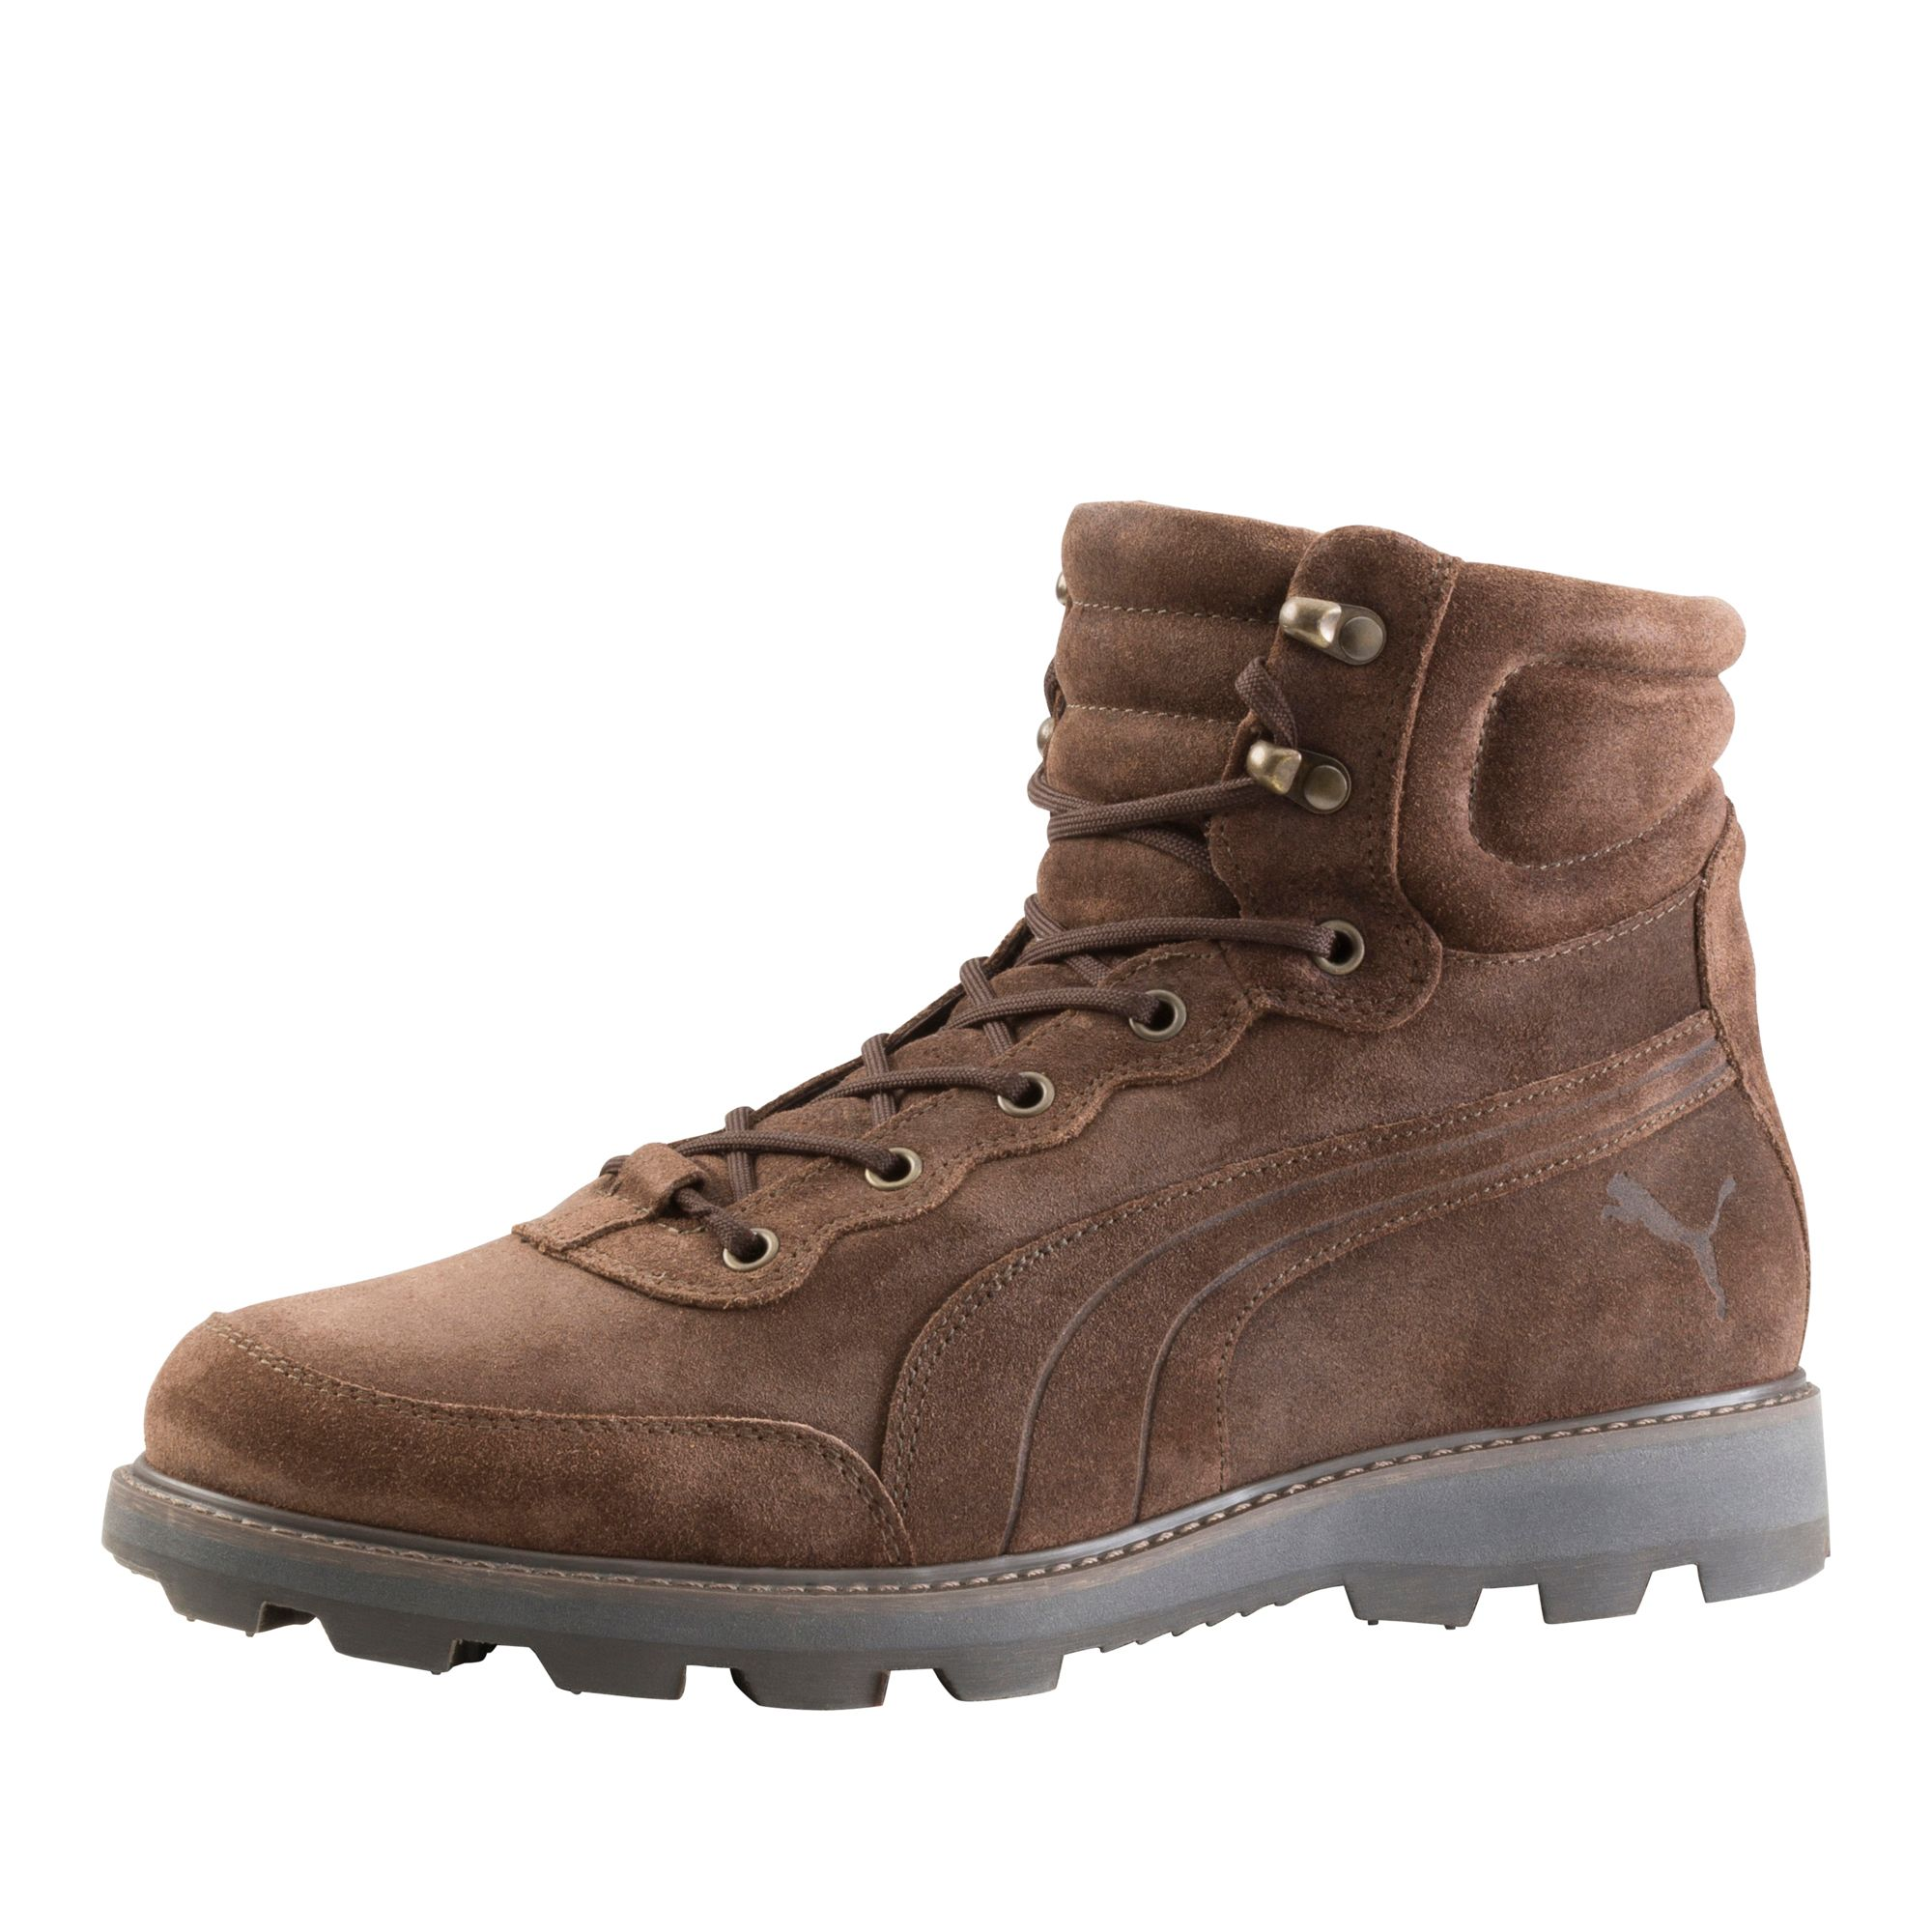 PUMA Desierto Talos Pietra Winter Boots Footwear Sneakers